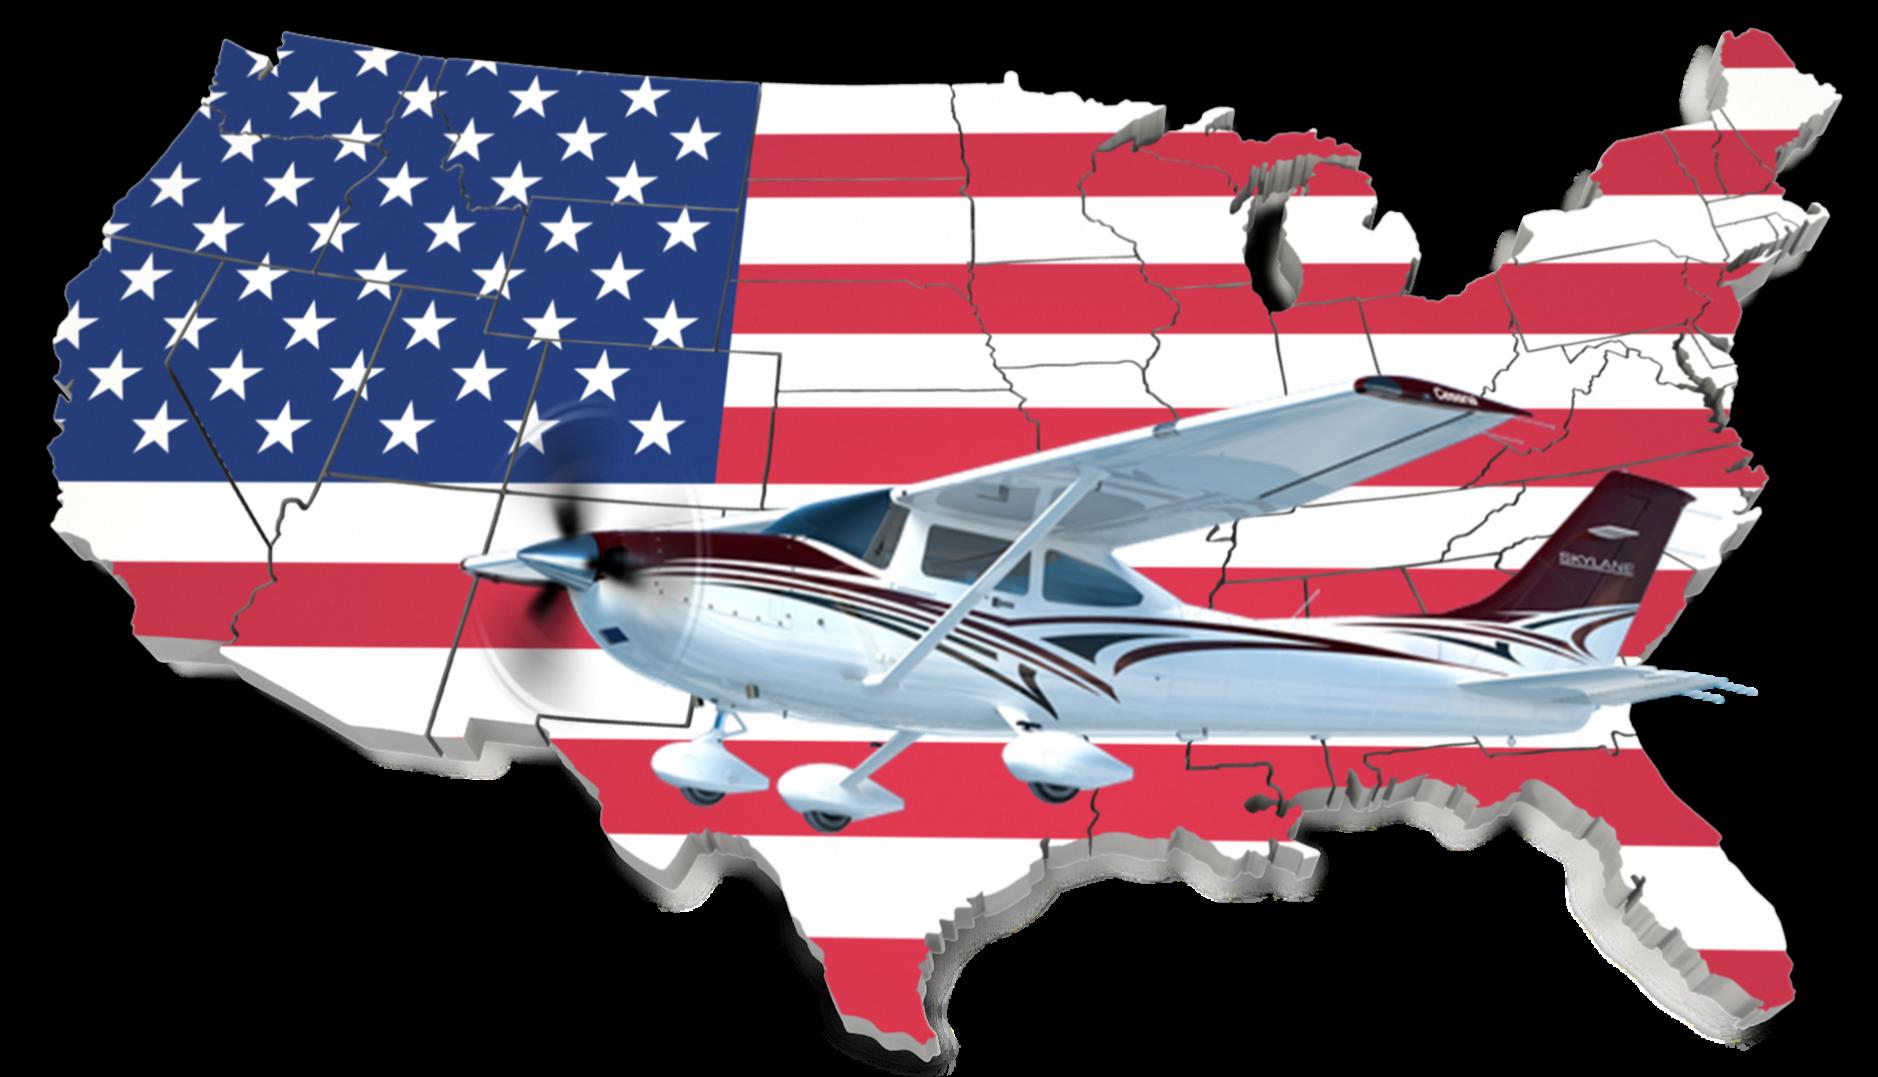 Pilot clipart pilot program. Aviasia general aviation development